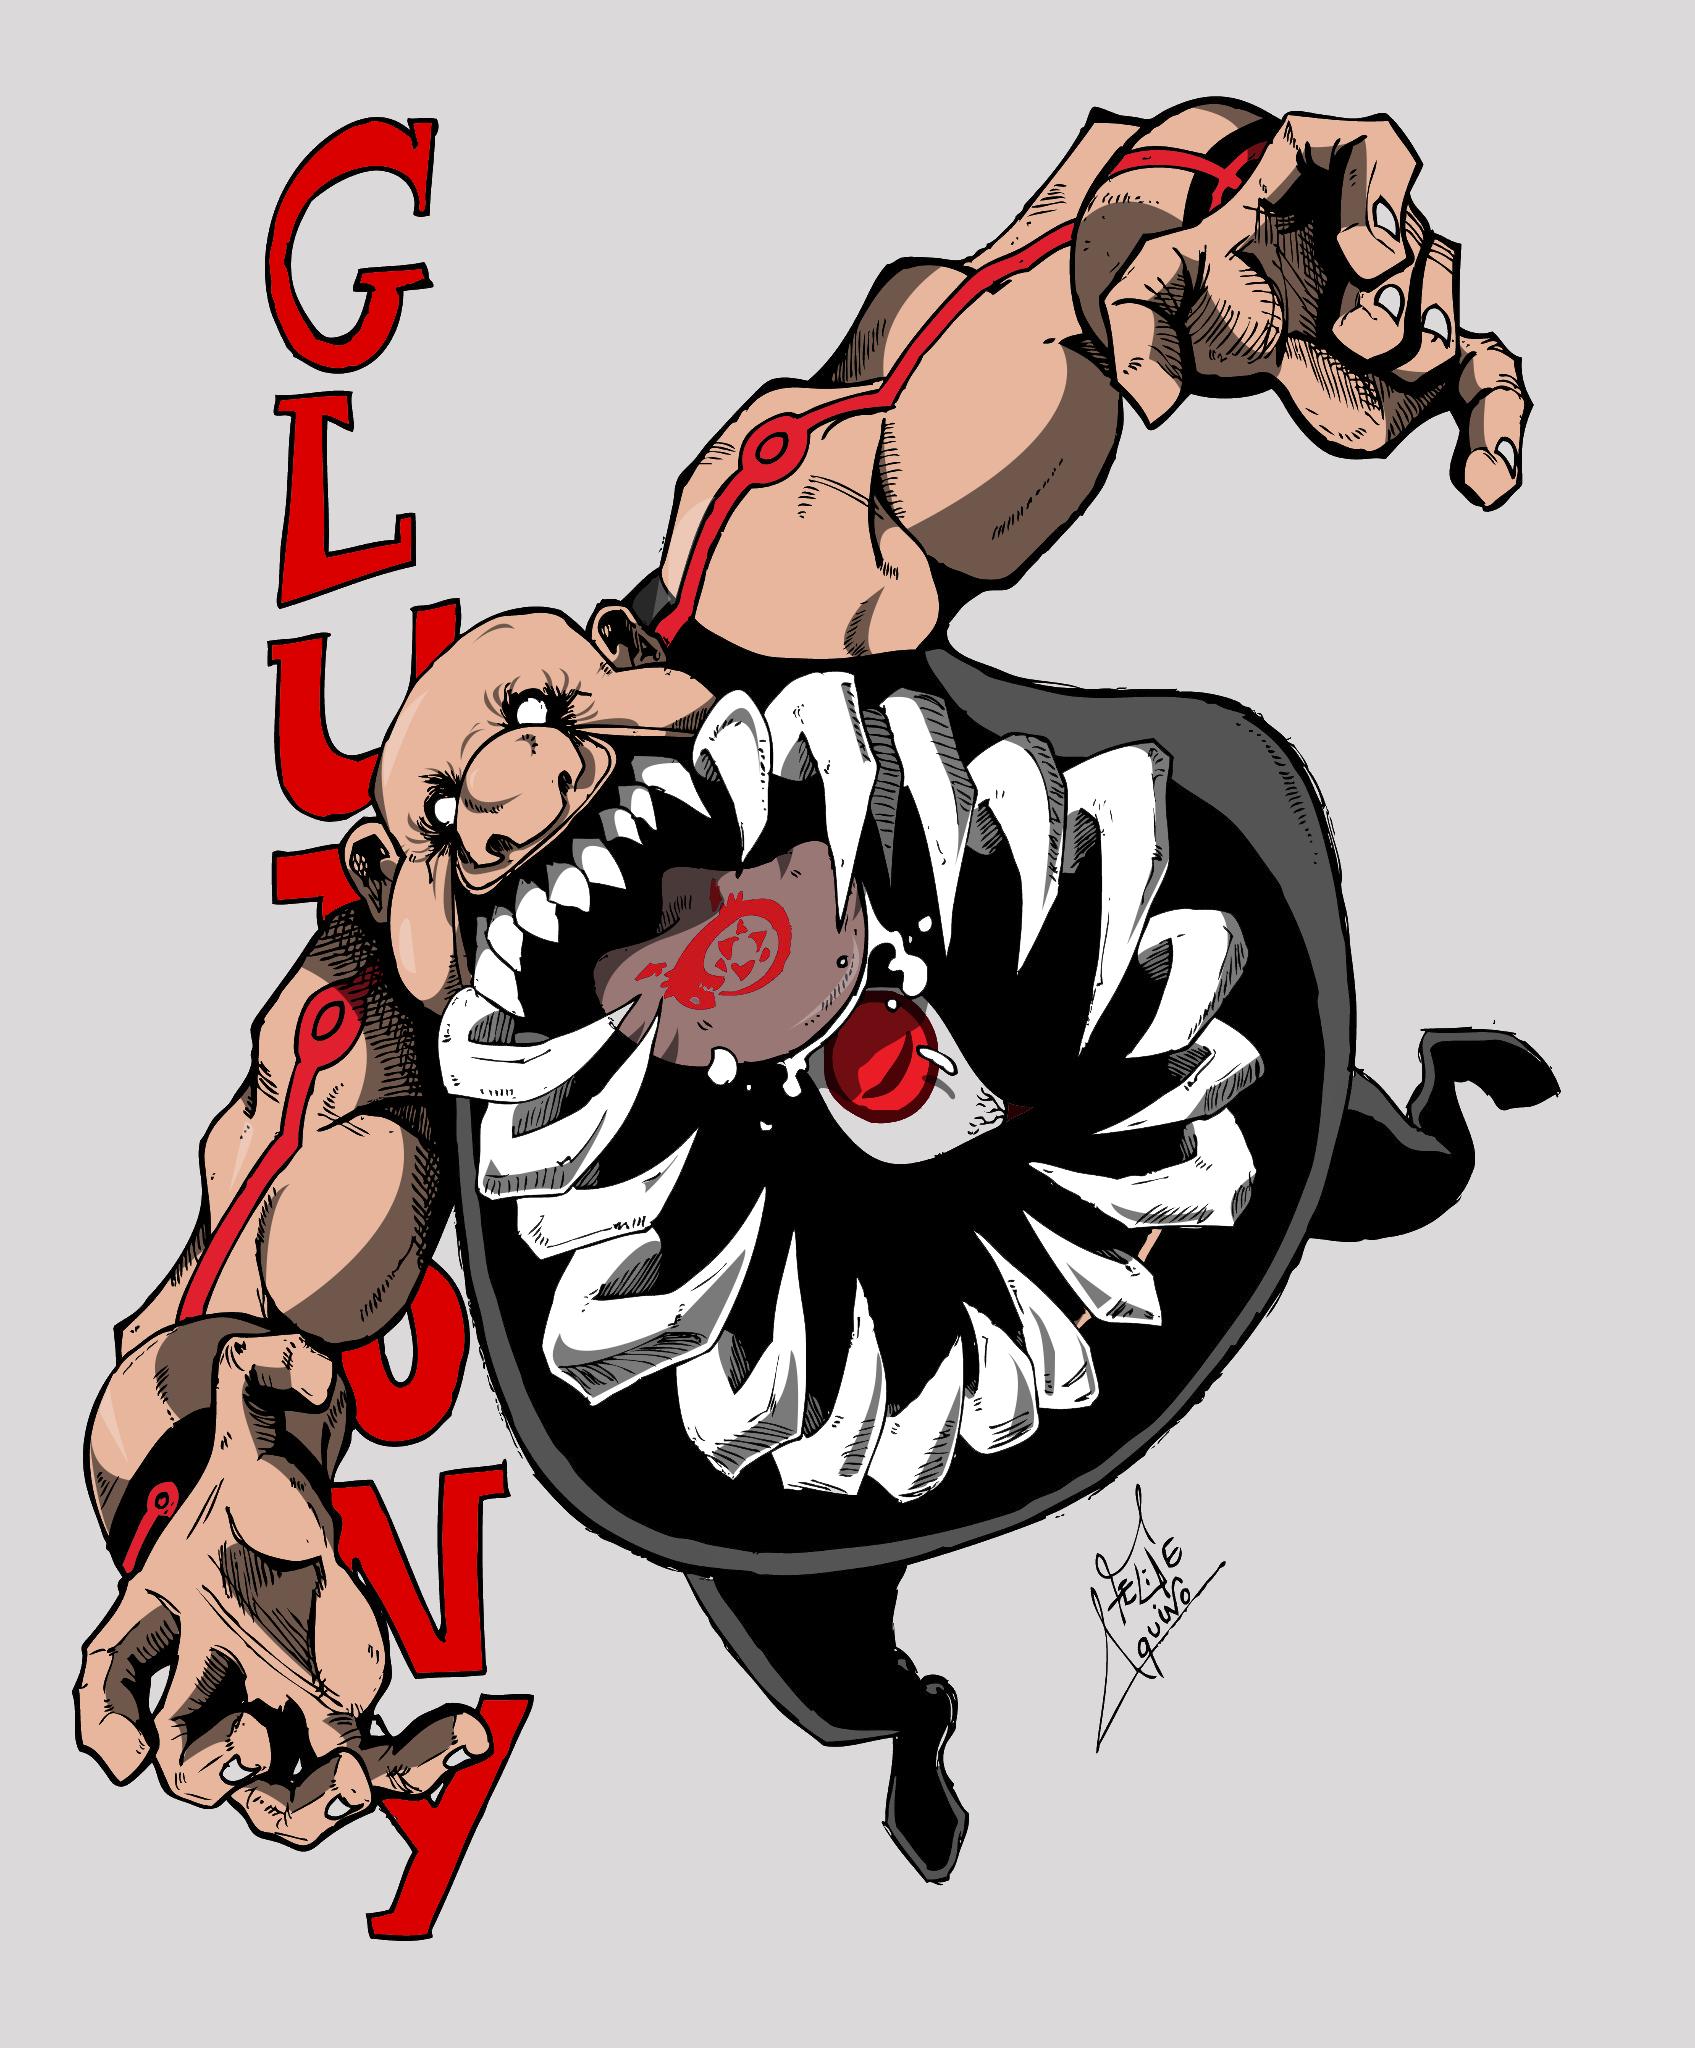 Gluttony - Gula